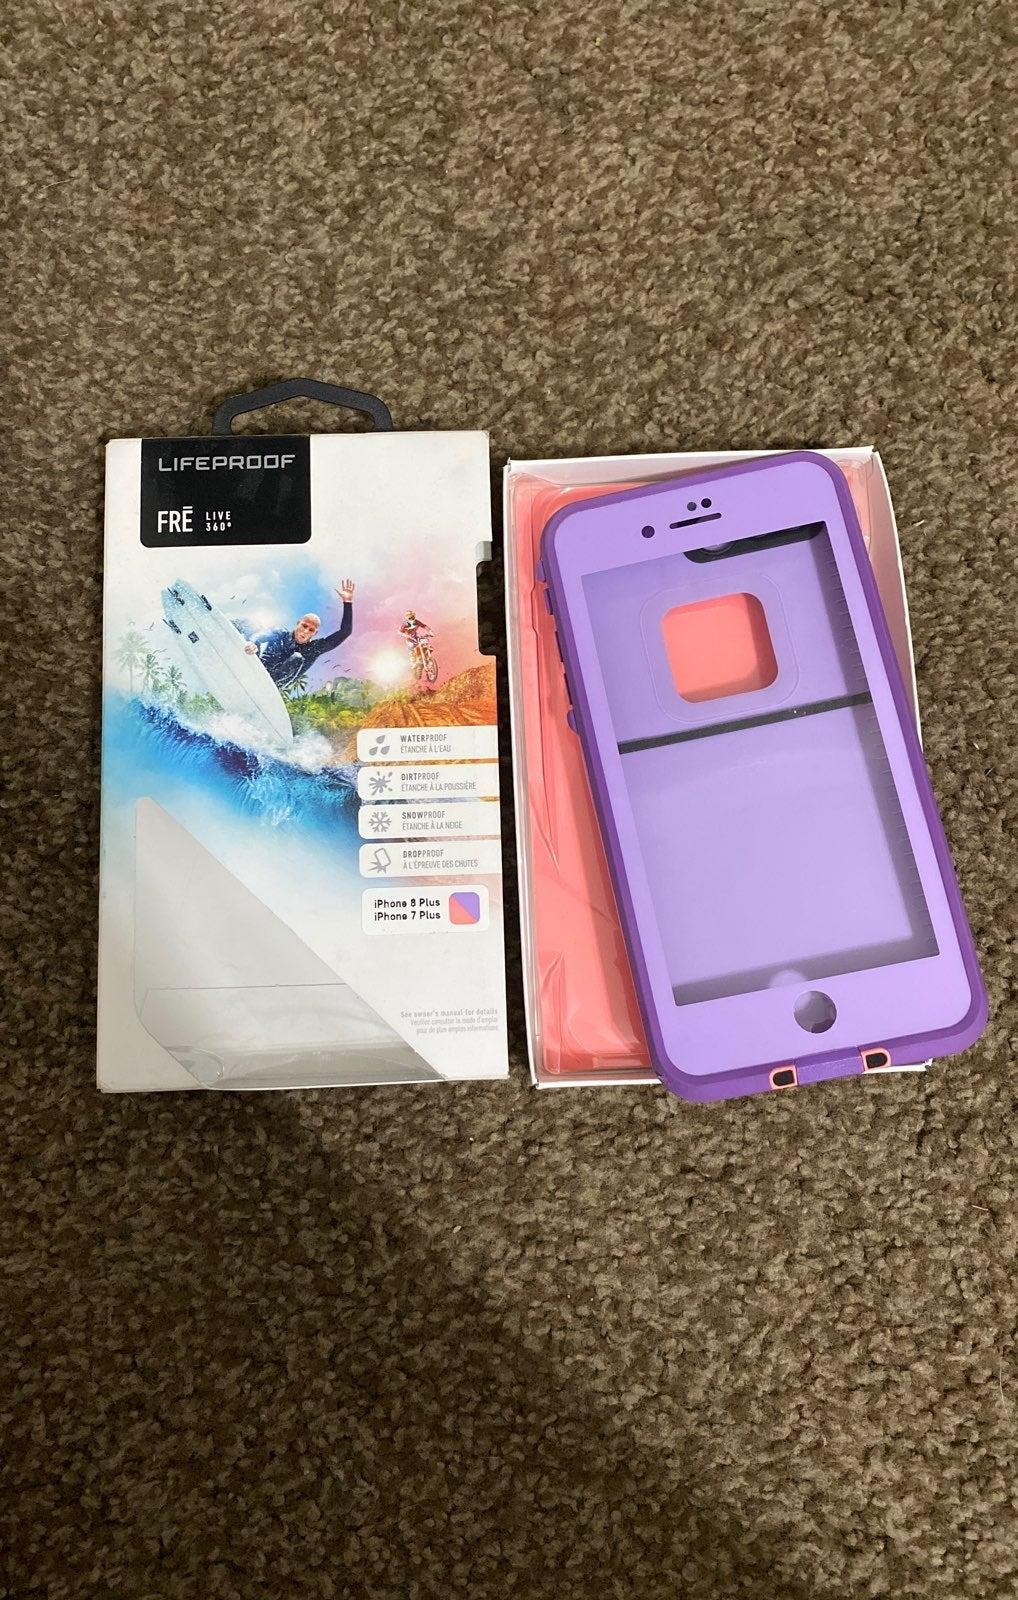 iphone 7/8 plus LifeProof case